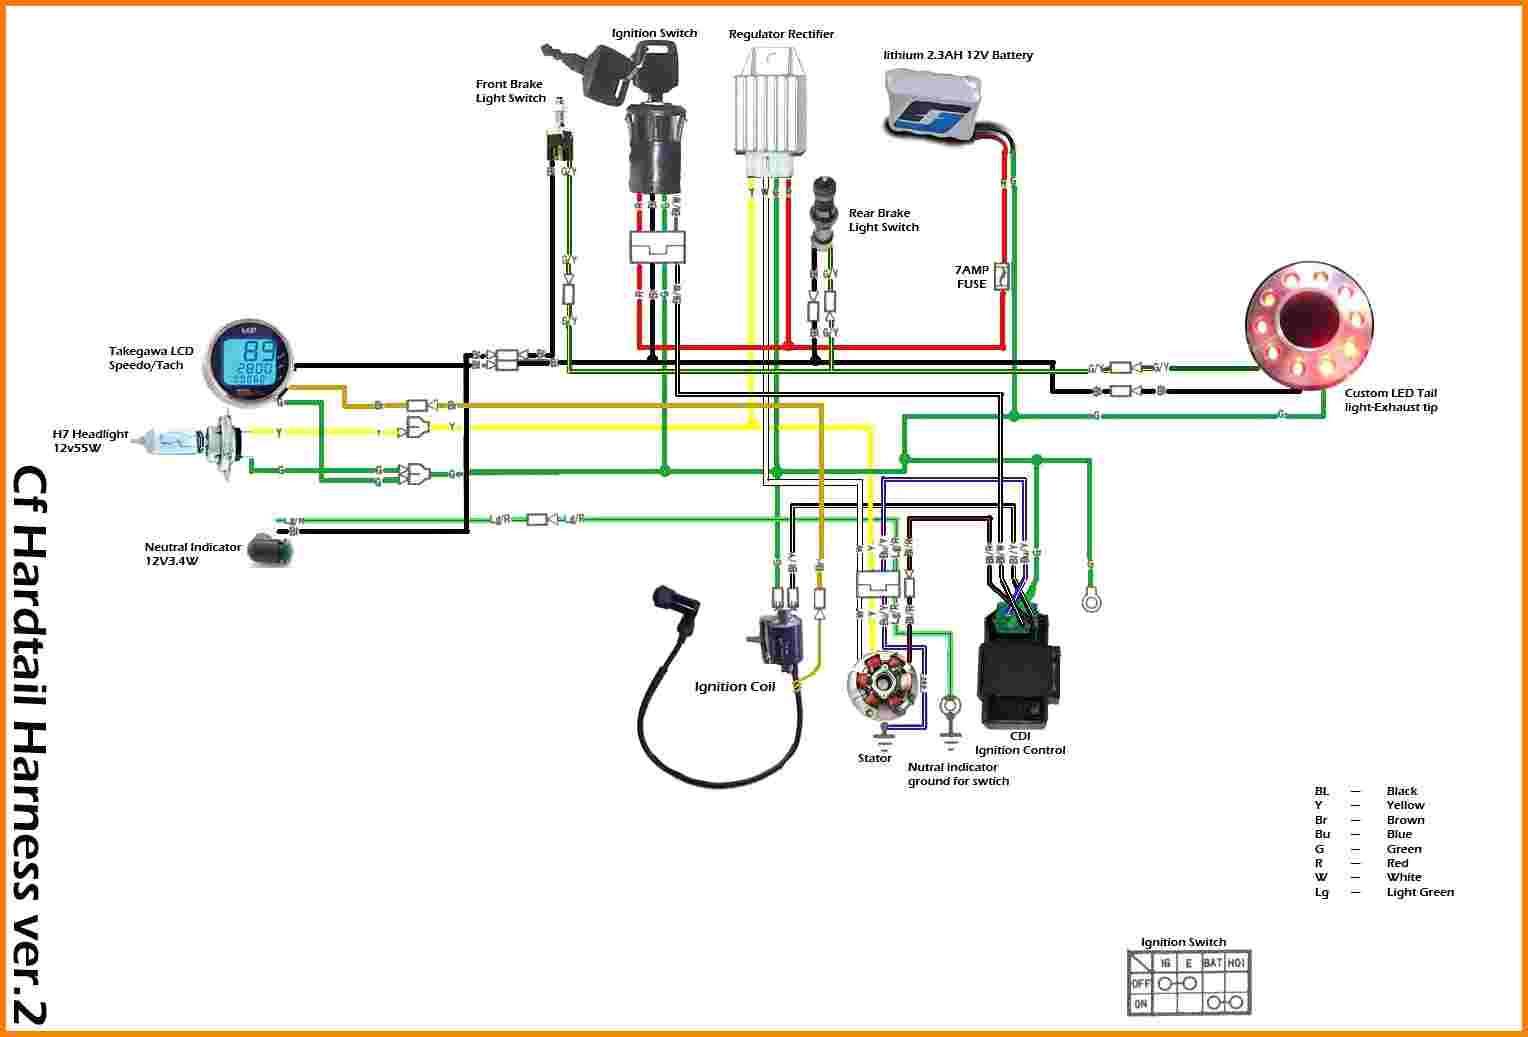 110Cc Wiring Harness | Wiring Diagram - 110Cc Atv Wiring Diagram